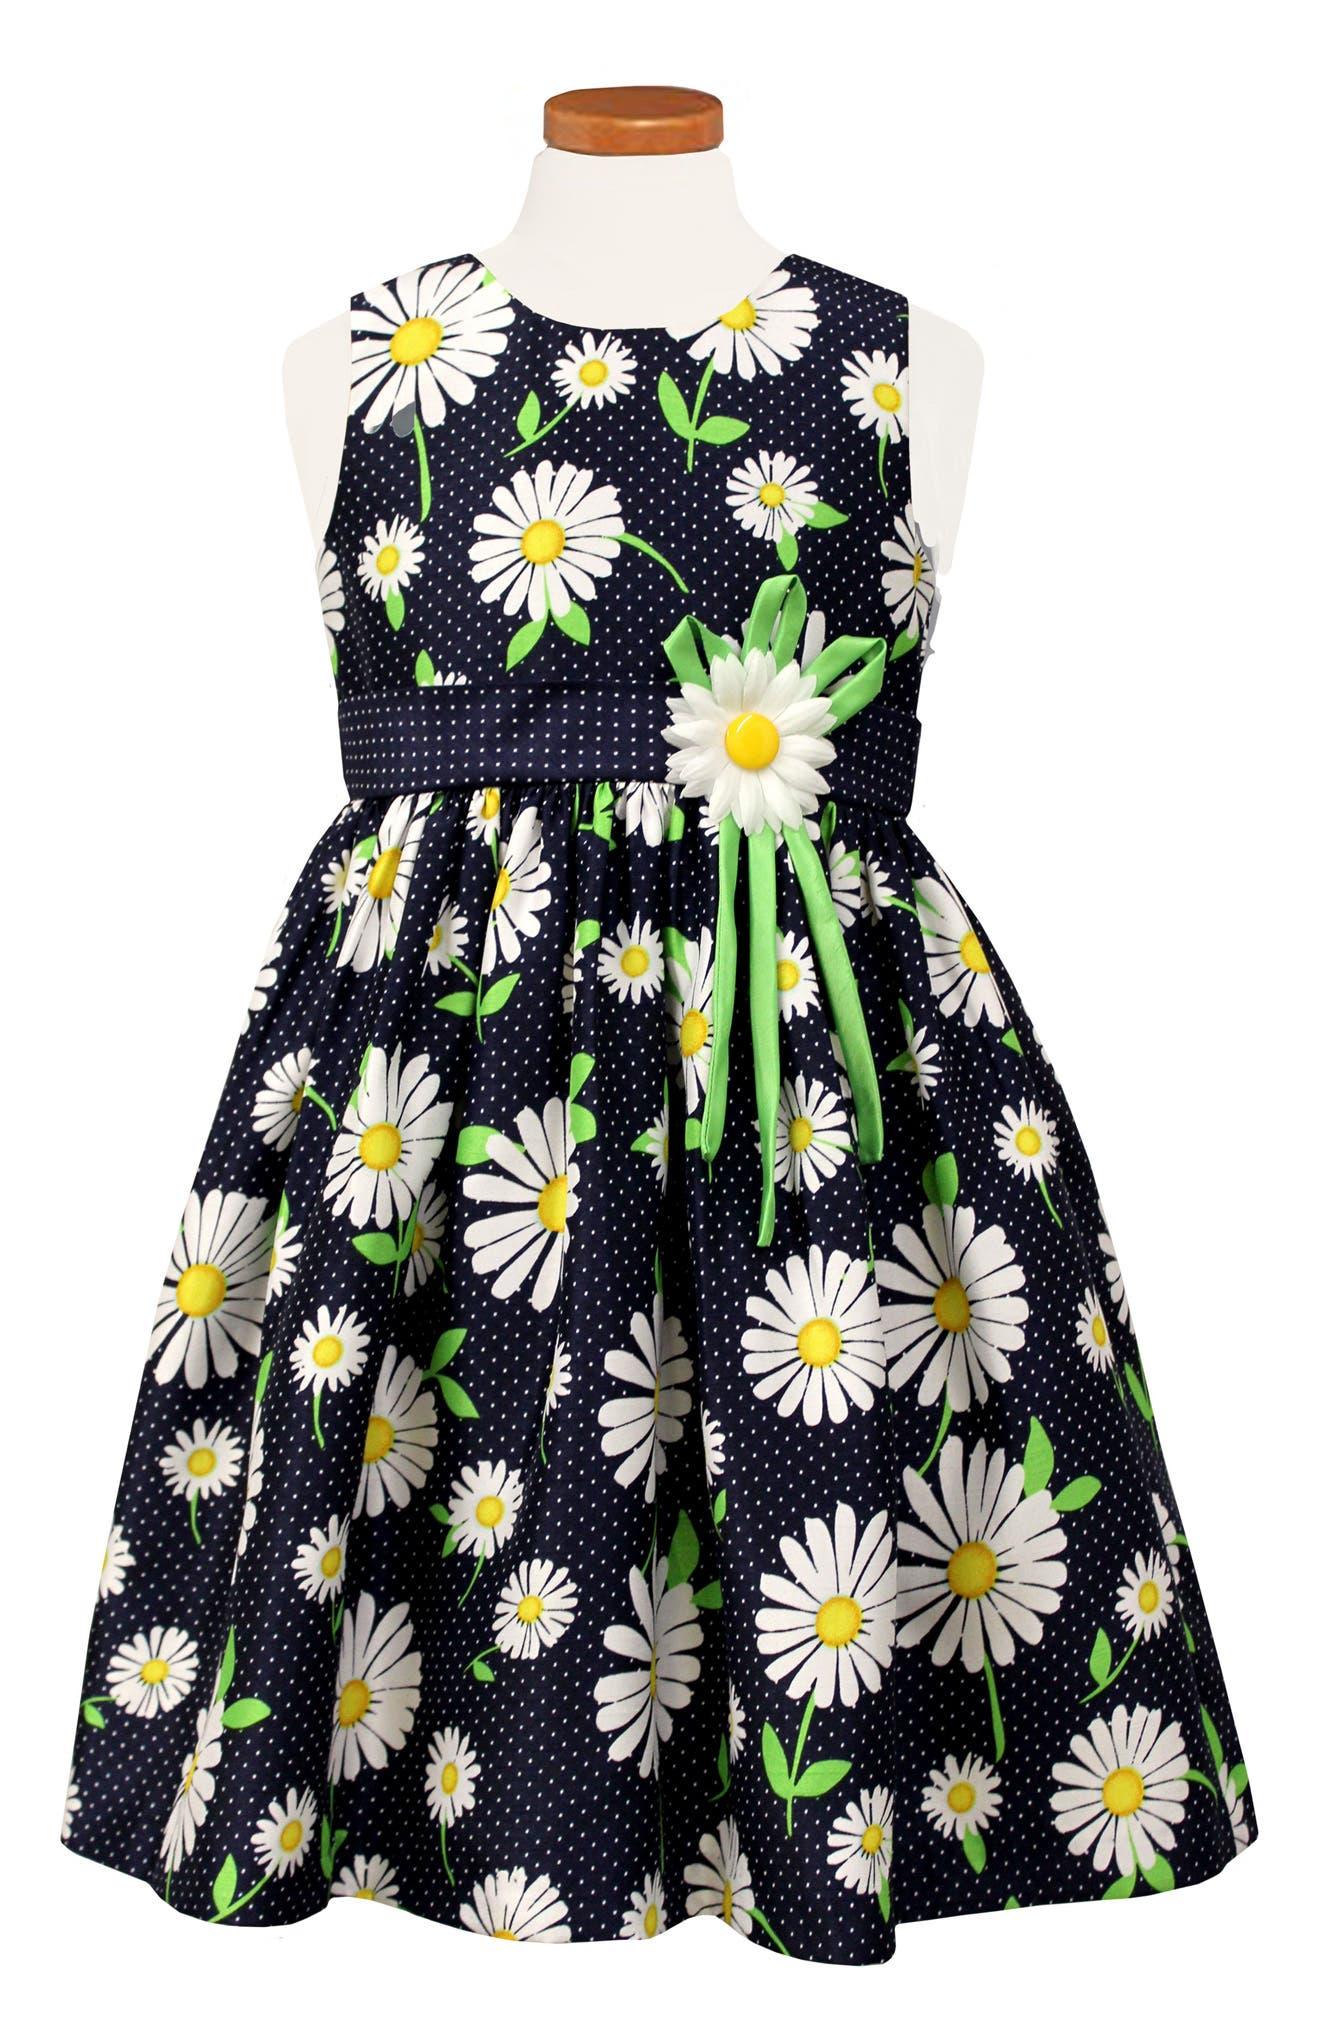 Floral Print Sleeveless Dress,                             Main thumbnail 1, color,                             400